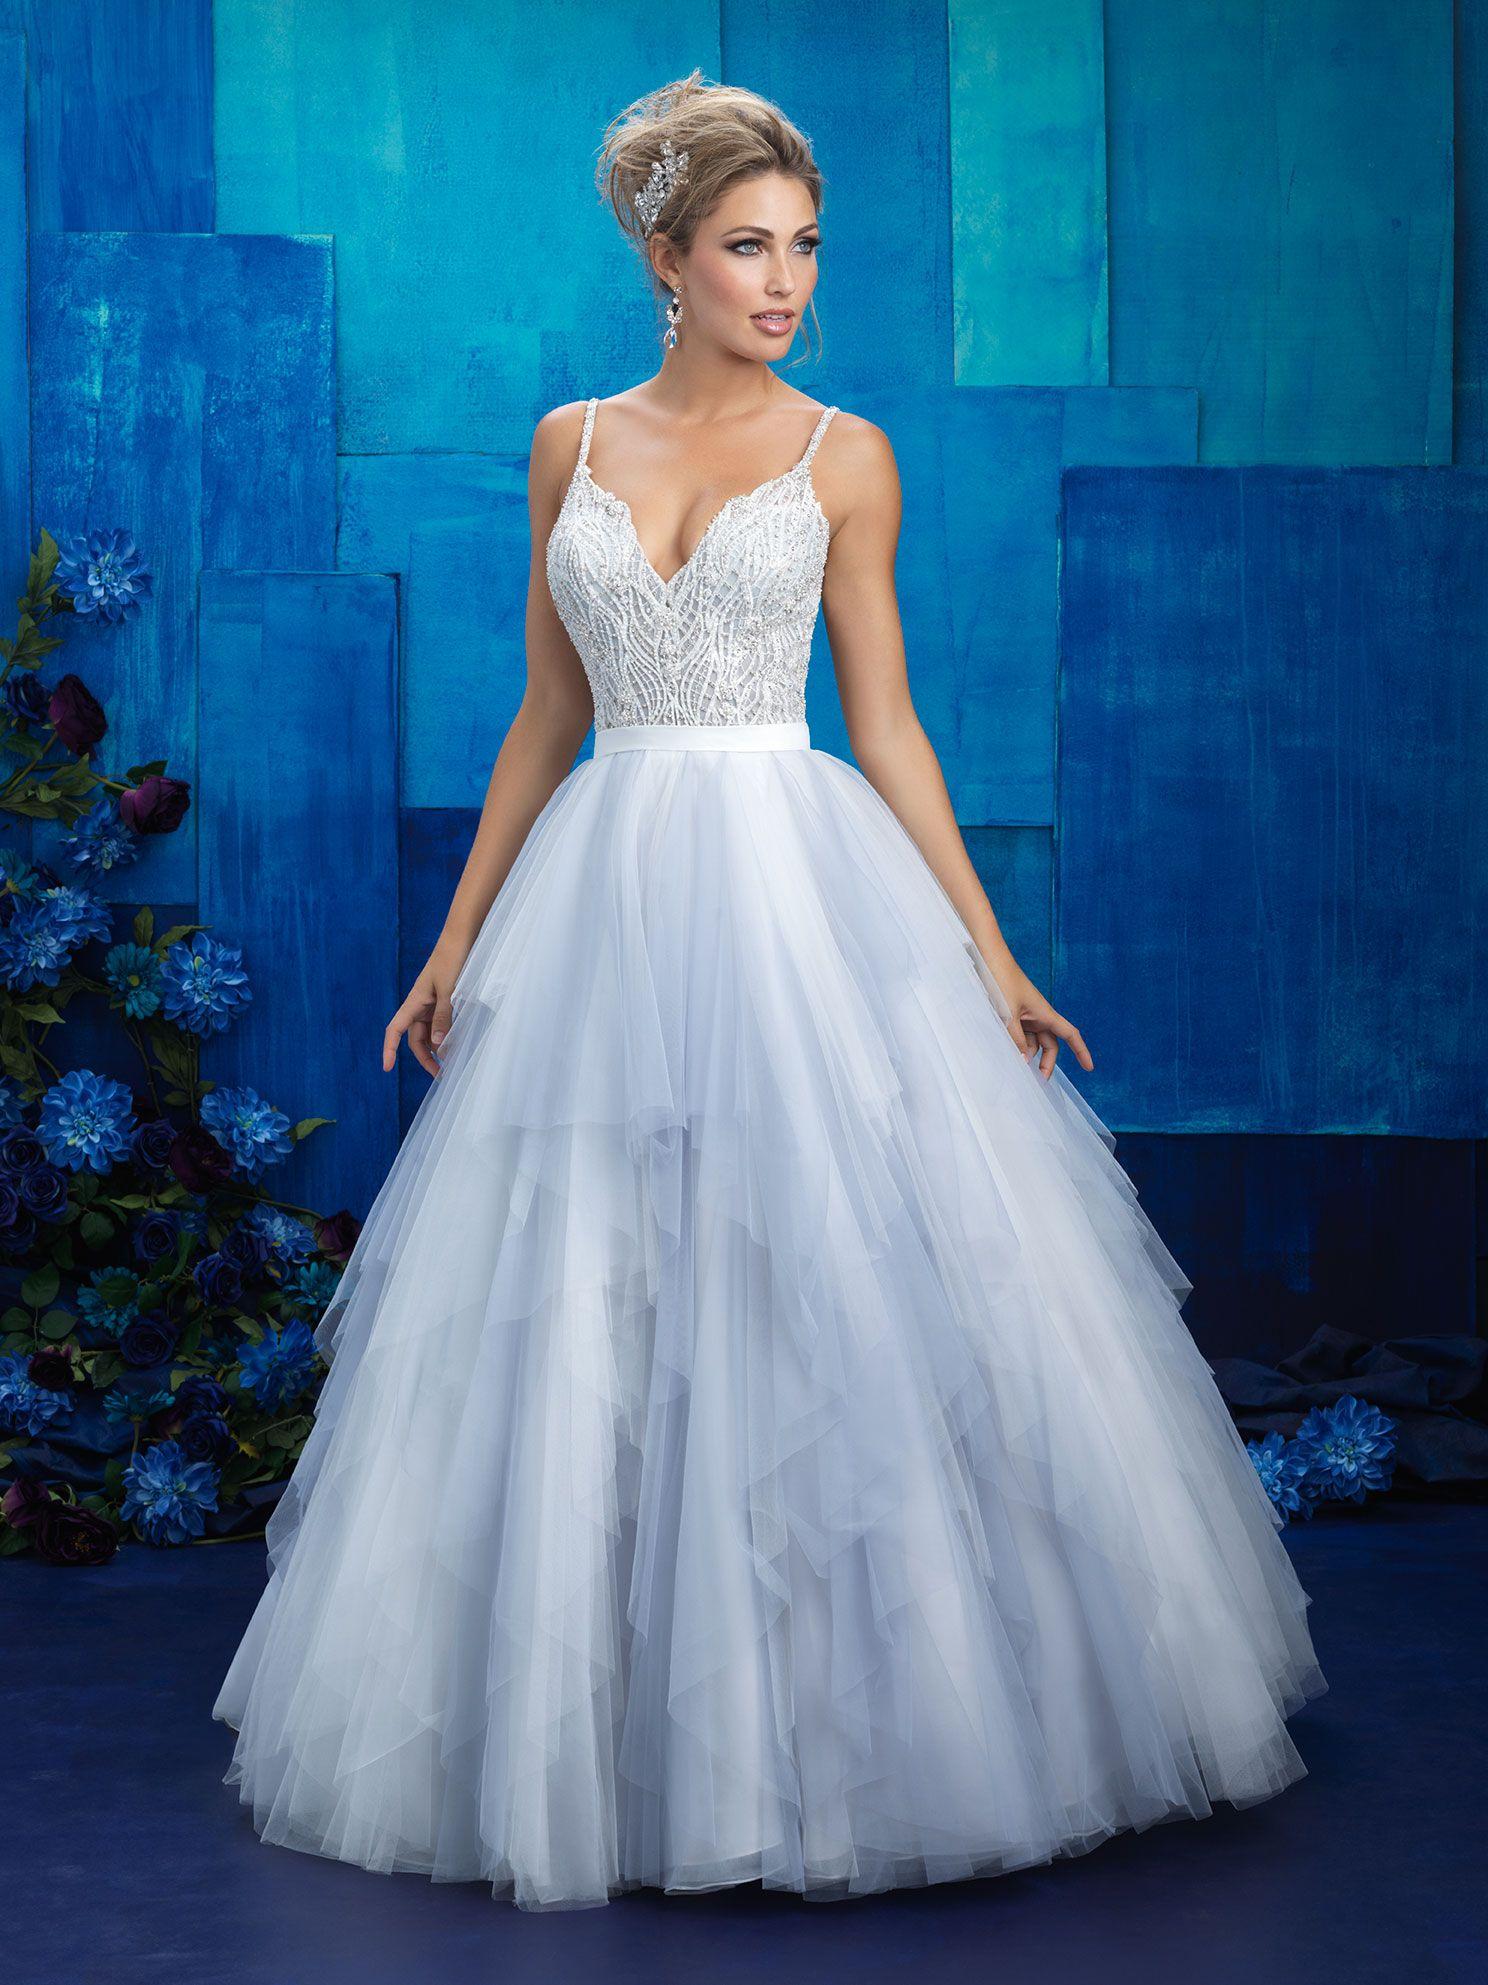 Wedding dresses for bridesmaids  thumbnail  Wedding dress inspirations  Pinterest  Allure bridal